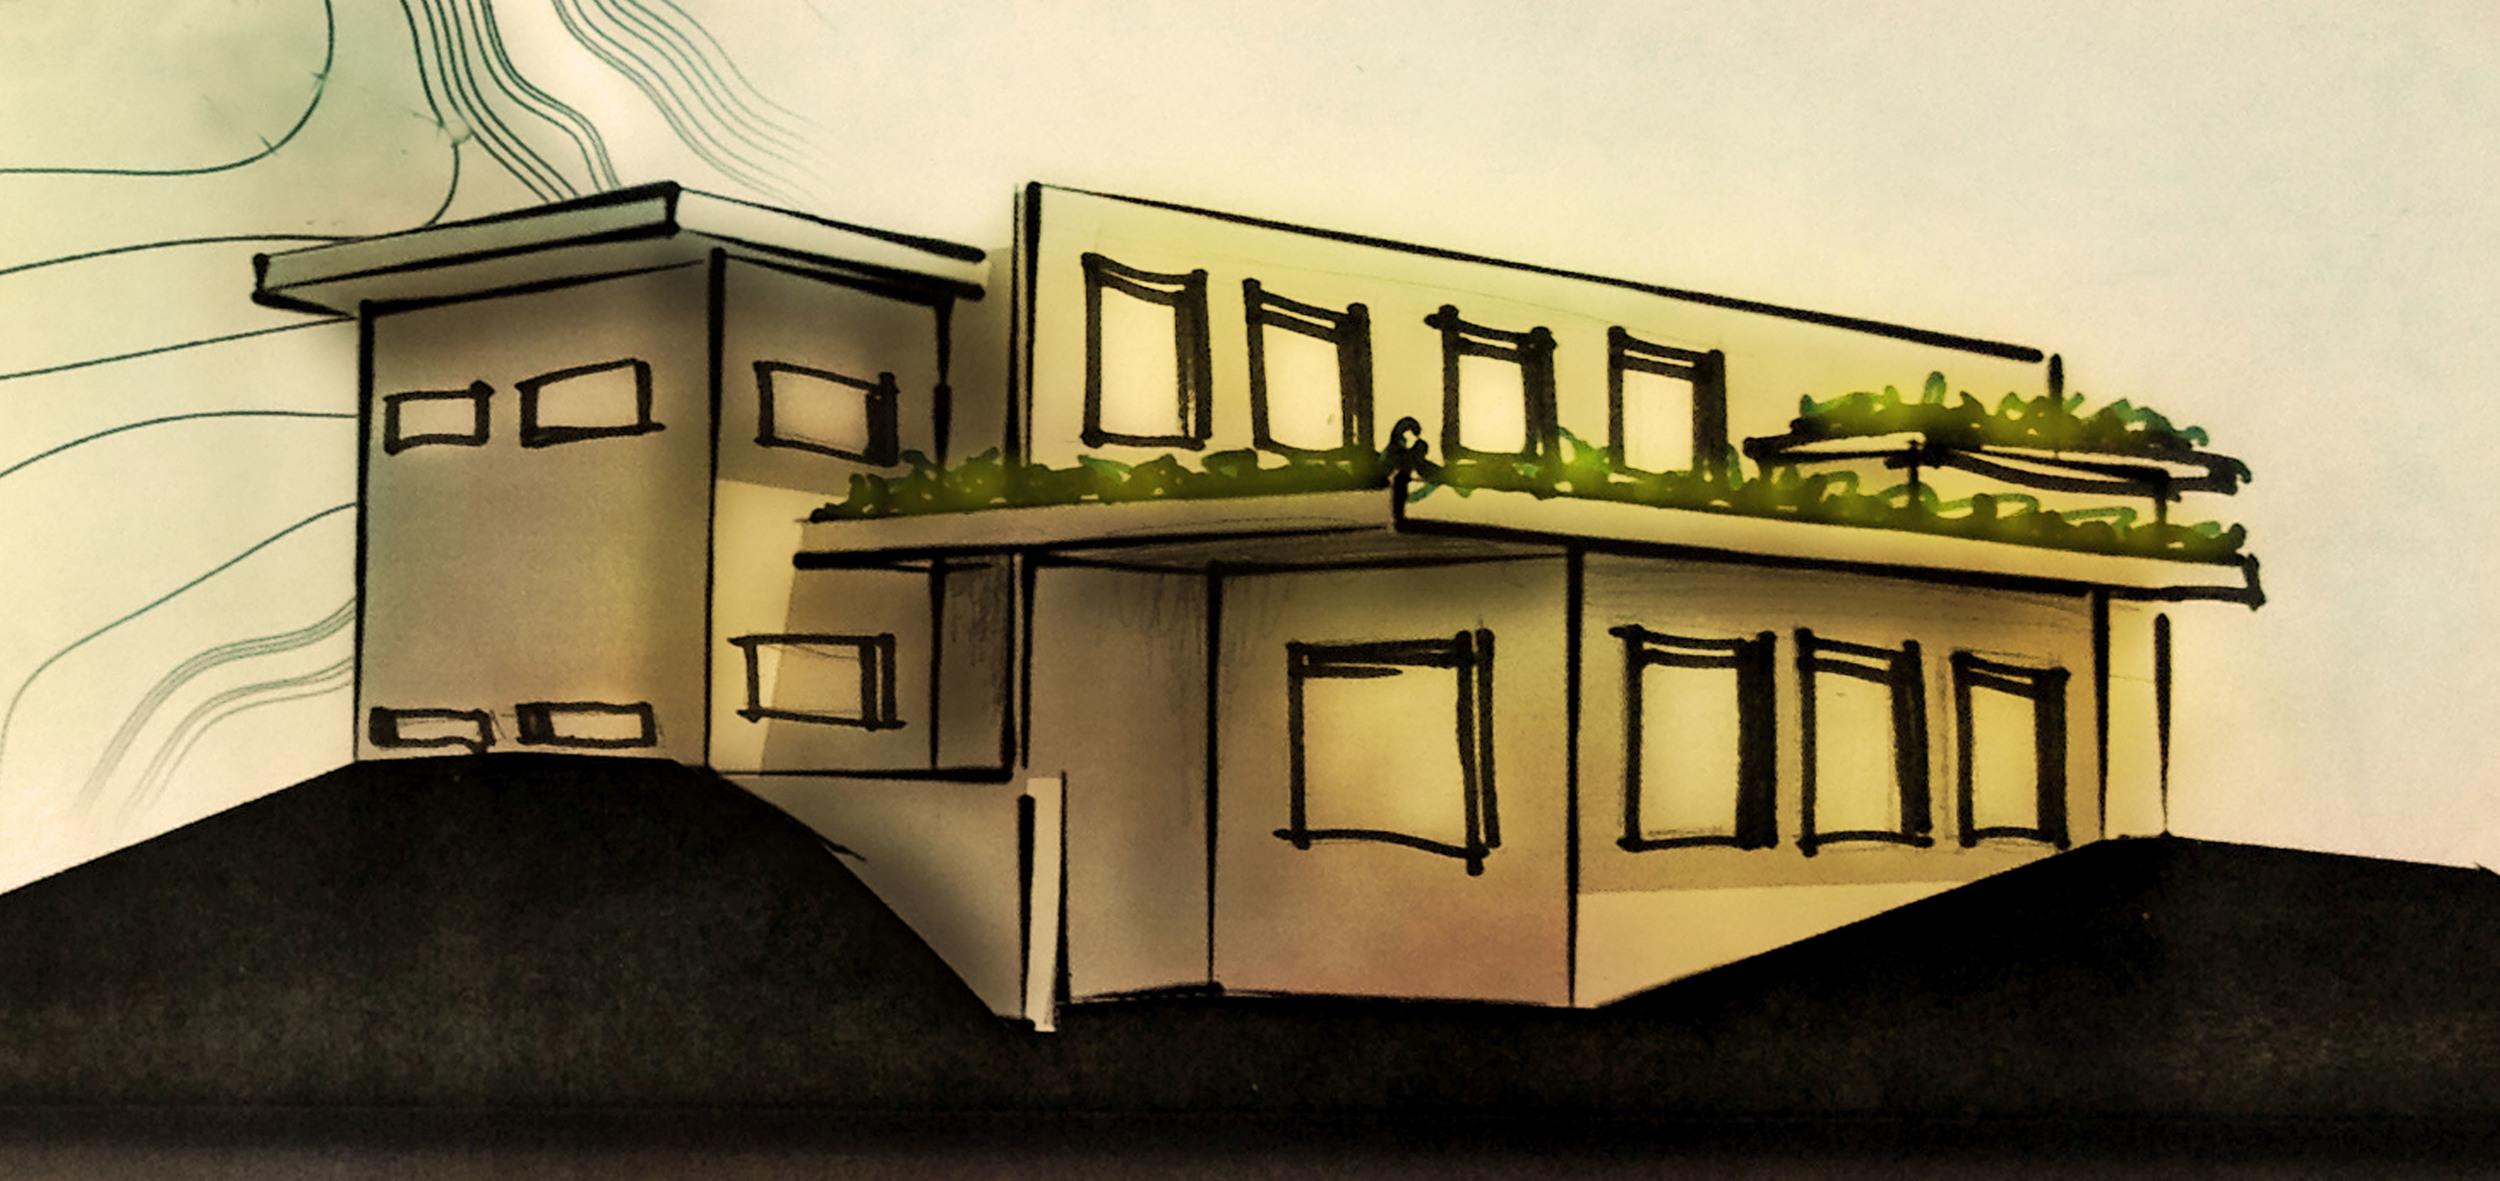 terracce2.jpg